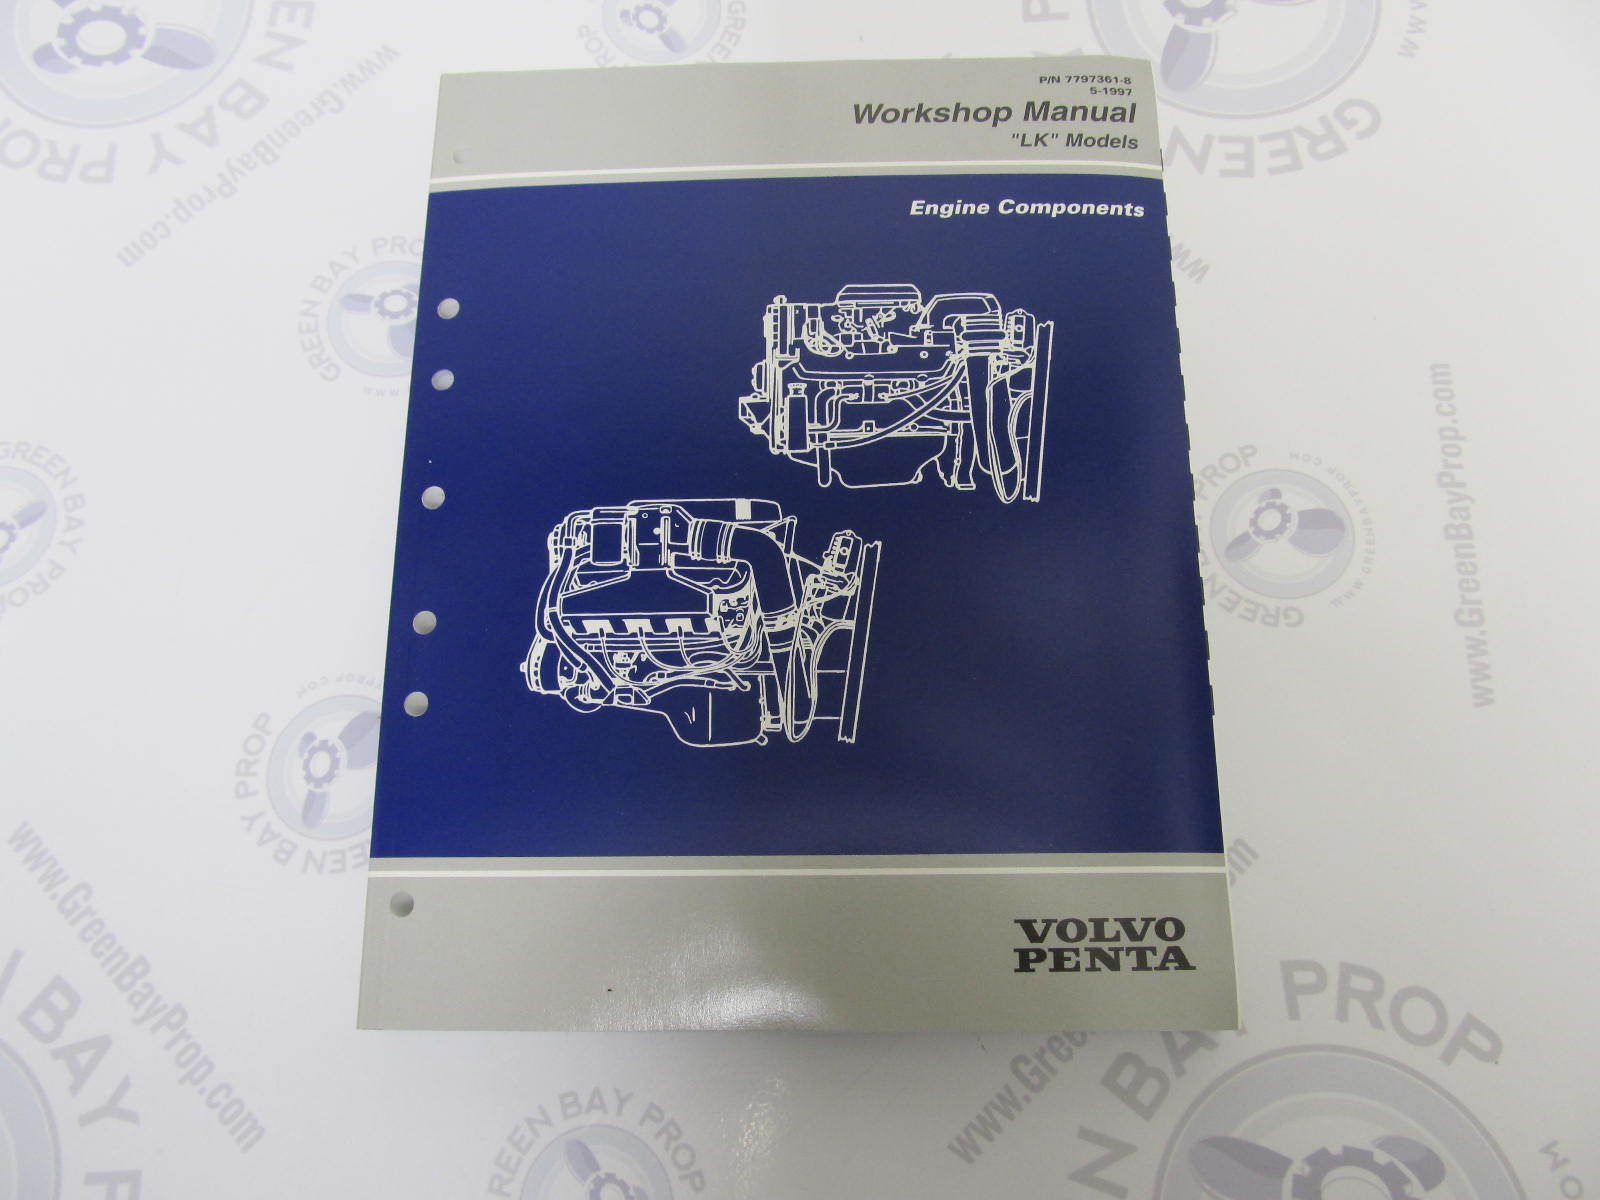 volvo penta sx workshop manual